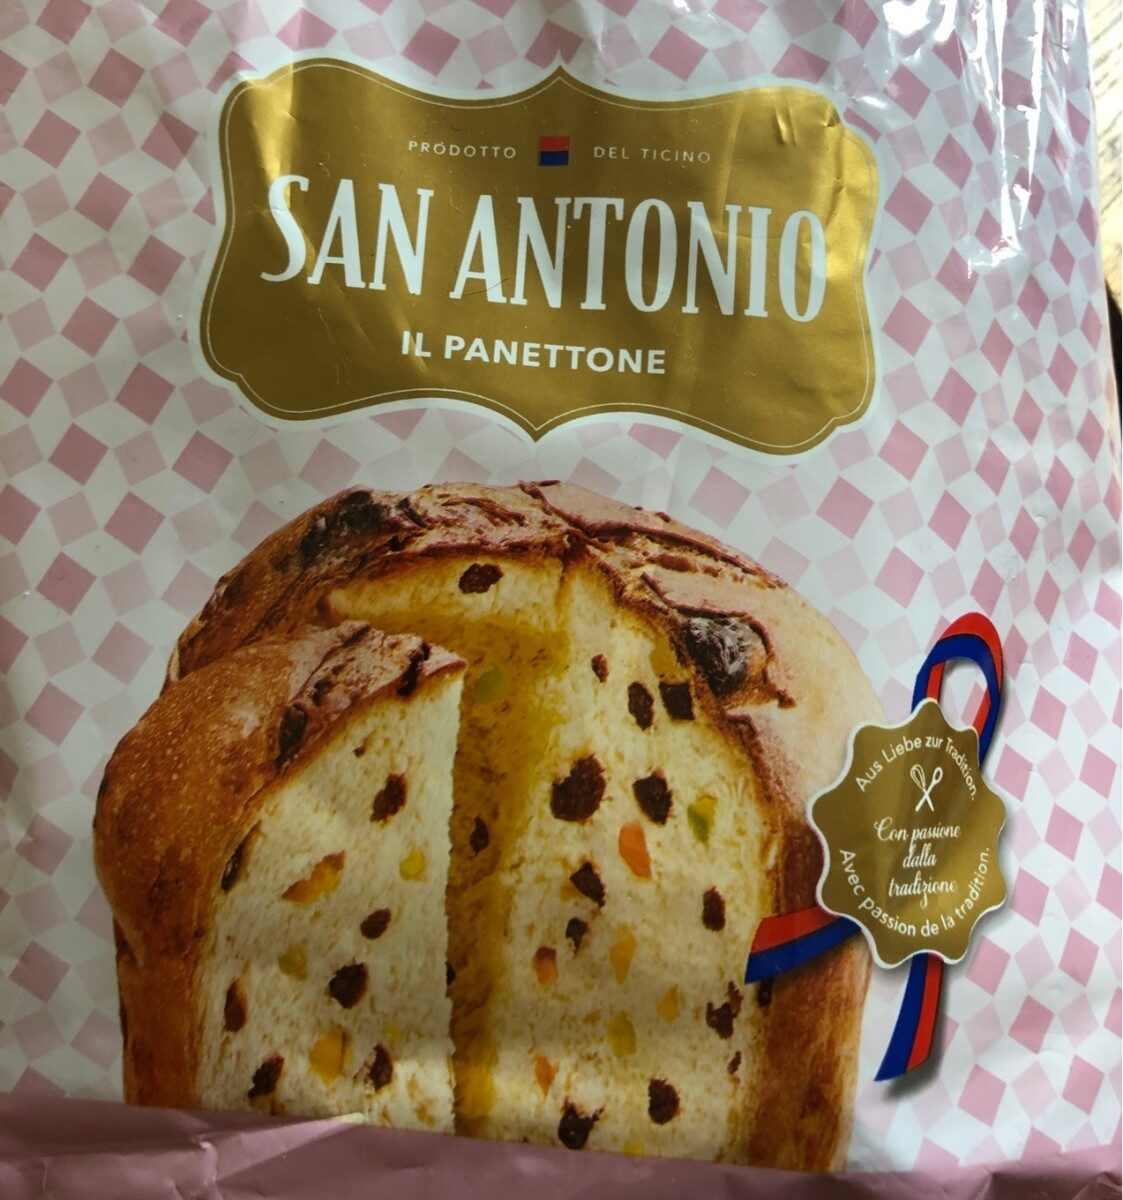 San Antonio il panetton - Product